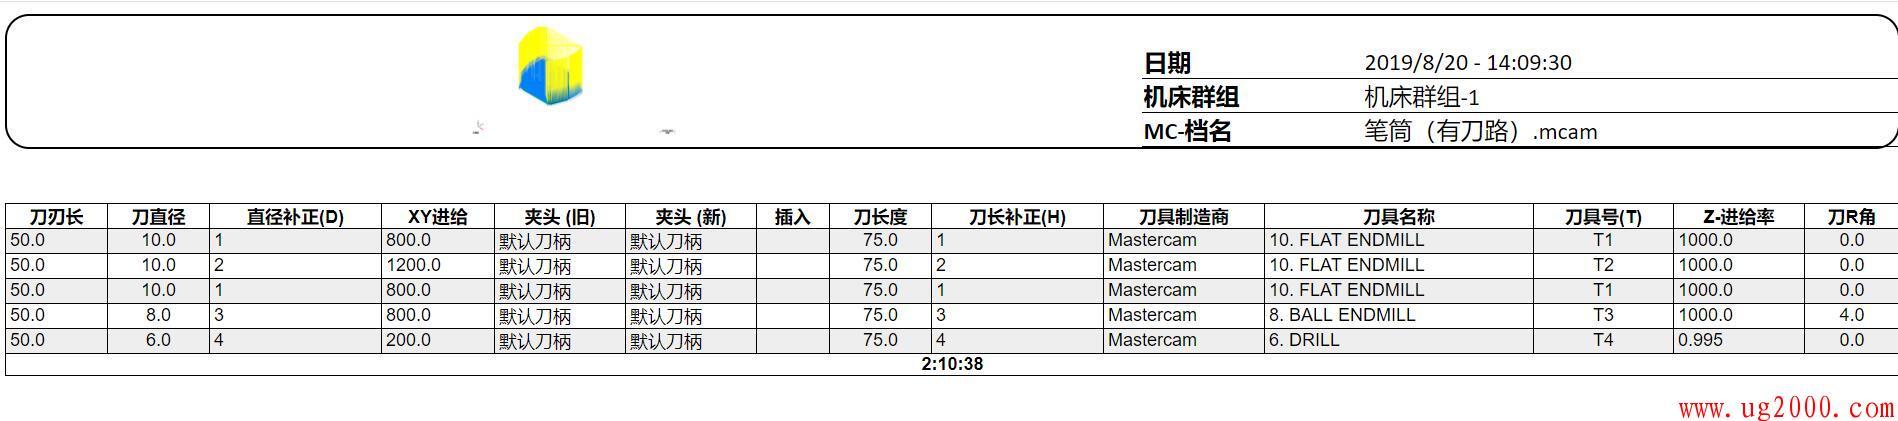 mastercam2020程序单,刀具清单,SetupX+_2020